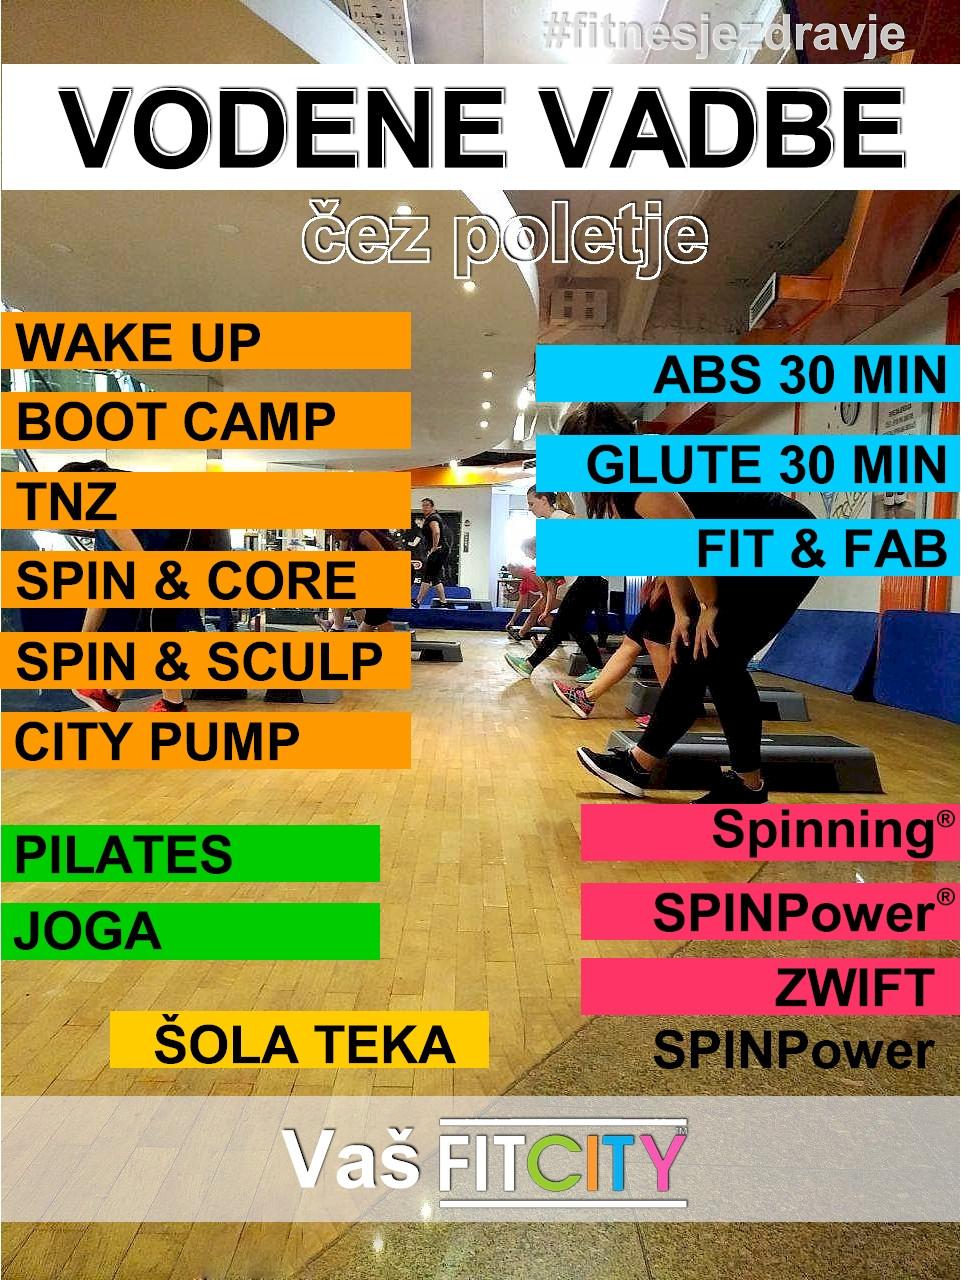 FITCITY Fitnes center | Gym & Spinning® Ljubljana